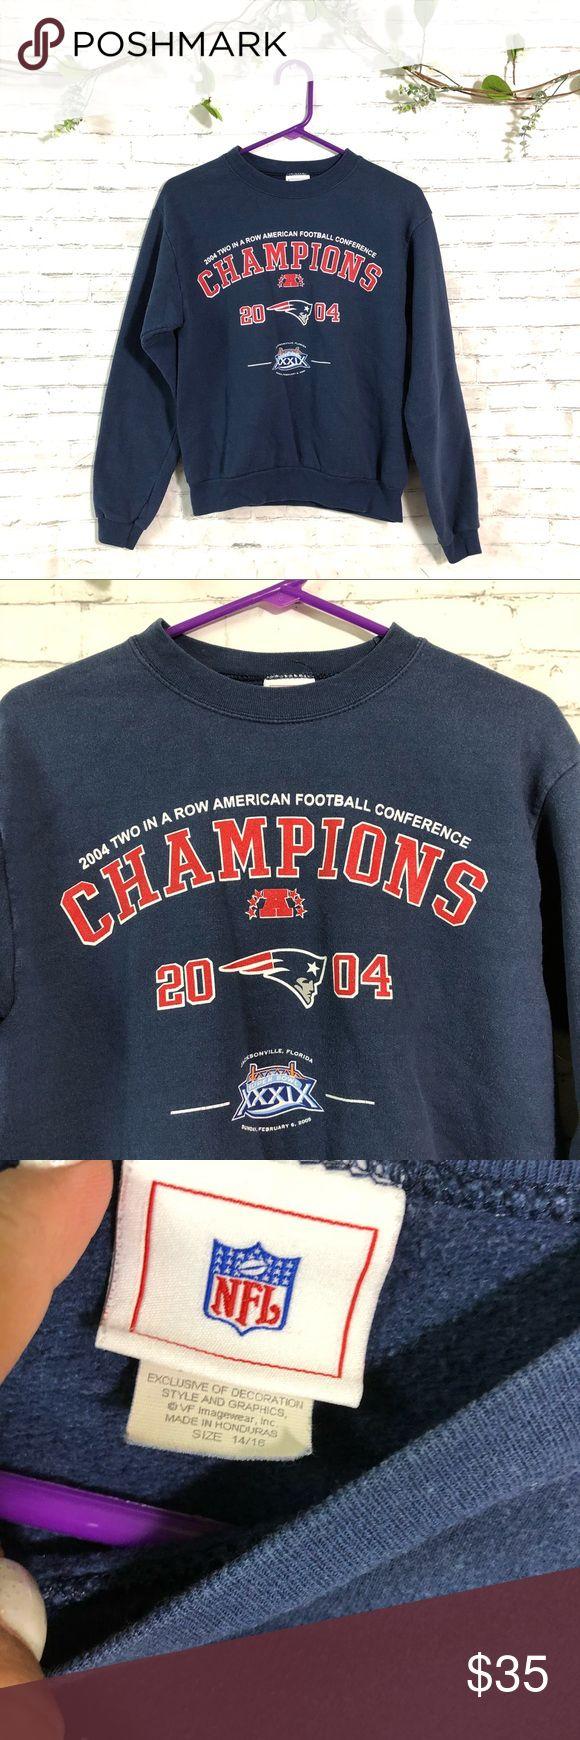 "Vintage New England patriots NFL sweatshirt Marked Sz 14/16 kids will fit Women's XS, 17"" chest measurements Vintage Sweaters Crew & Scoop Necks"